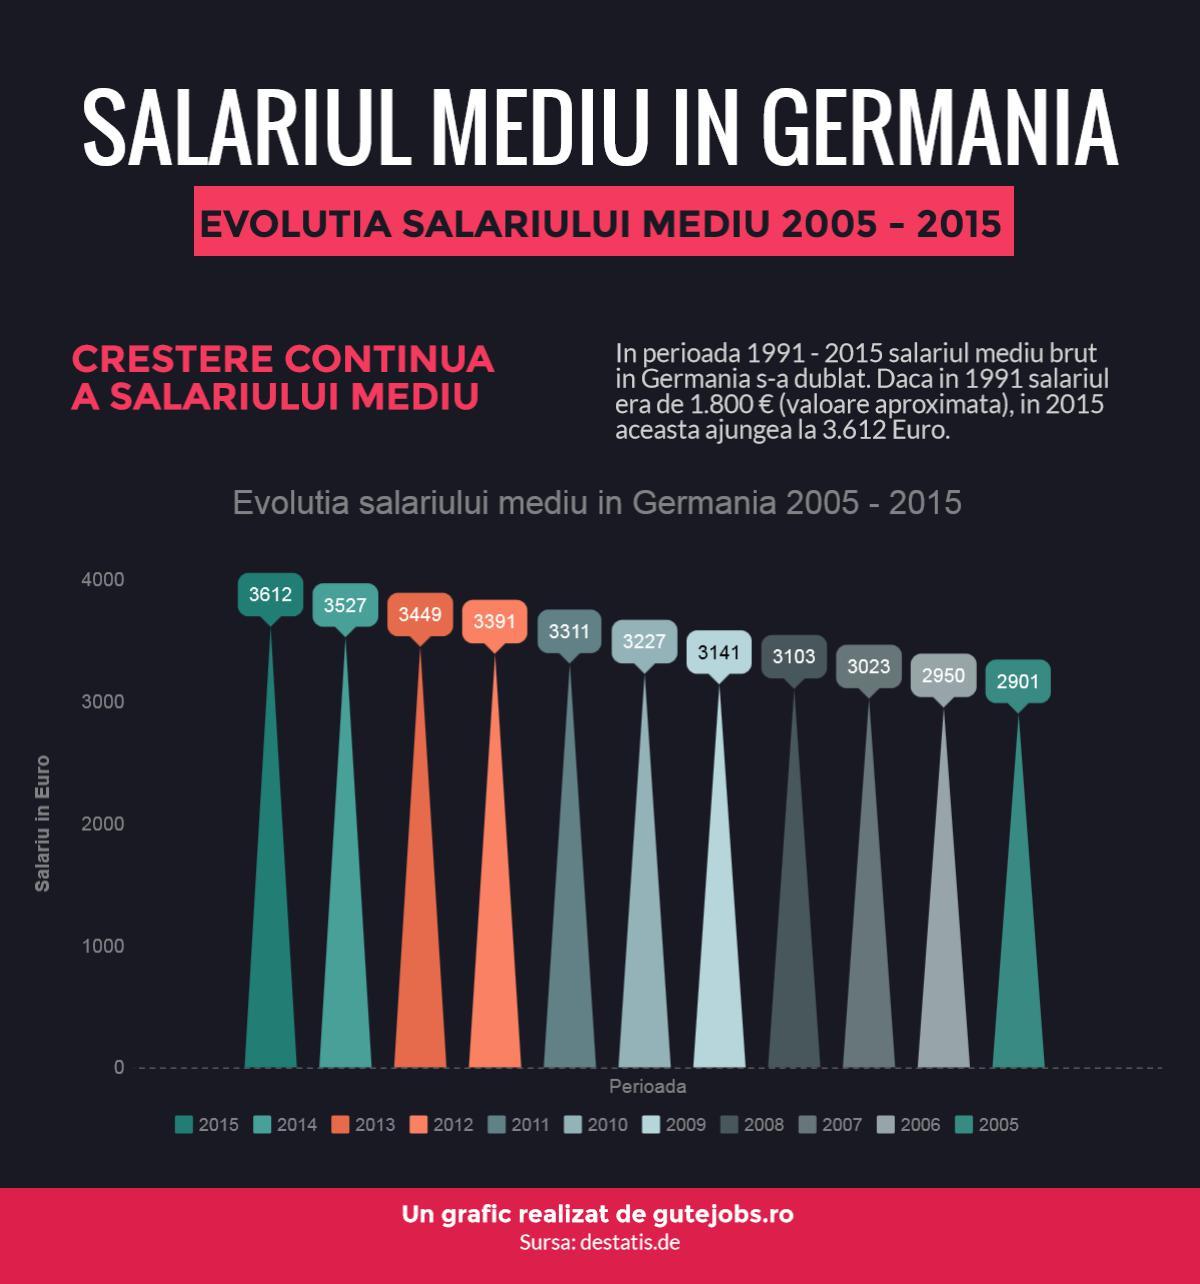 Salariul mediu in Germania - Evolutie 2000 - 2015